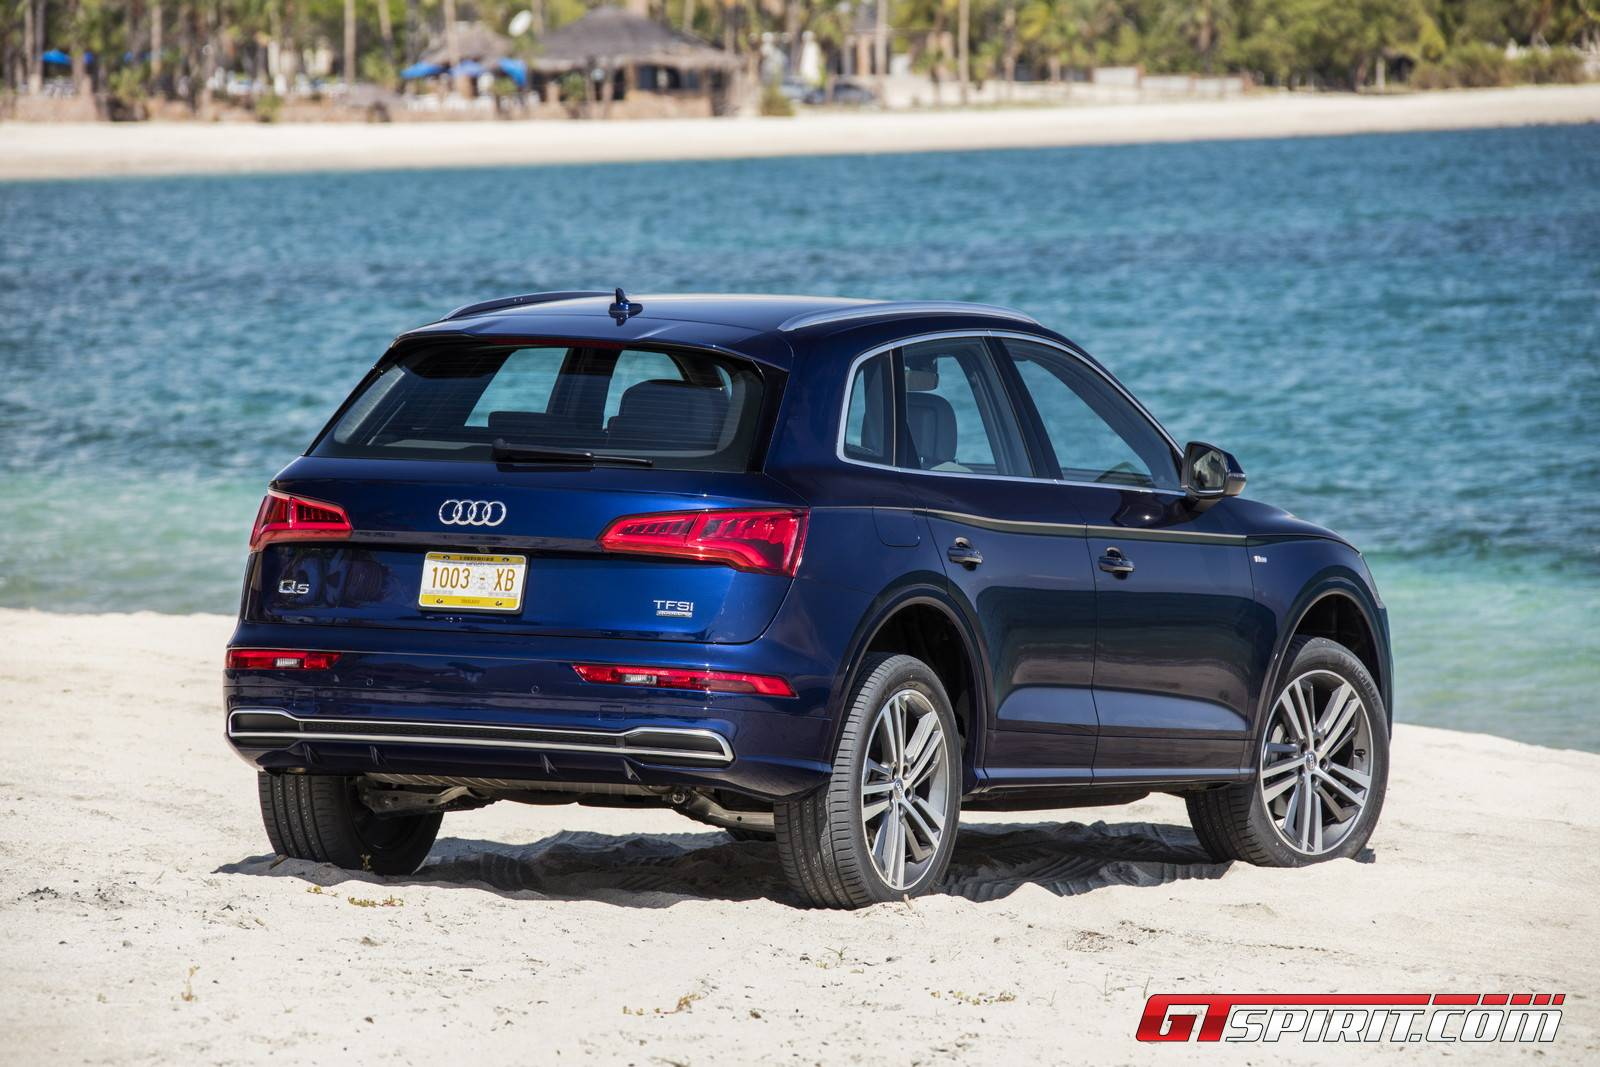 2017 Audi Q5 The Second Generation Review Gtspirit